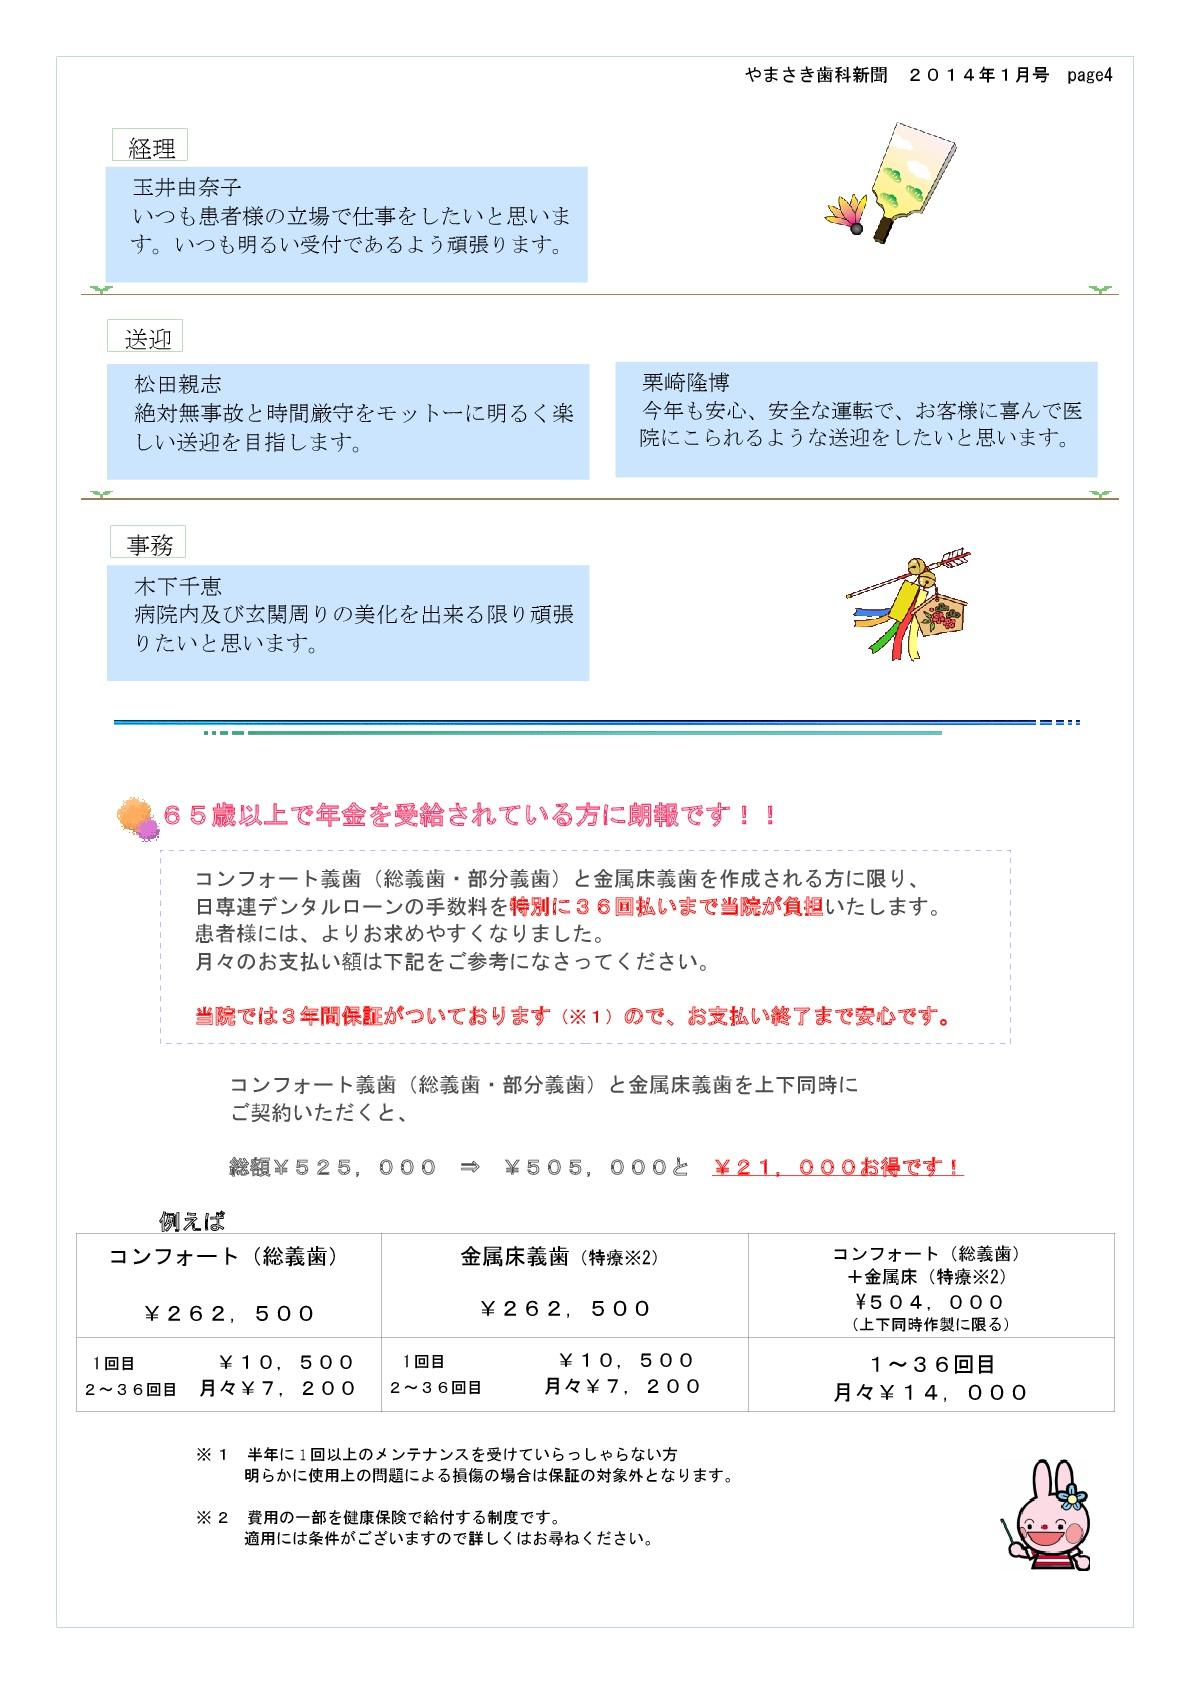 sinbun14-1-004